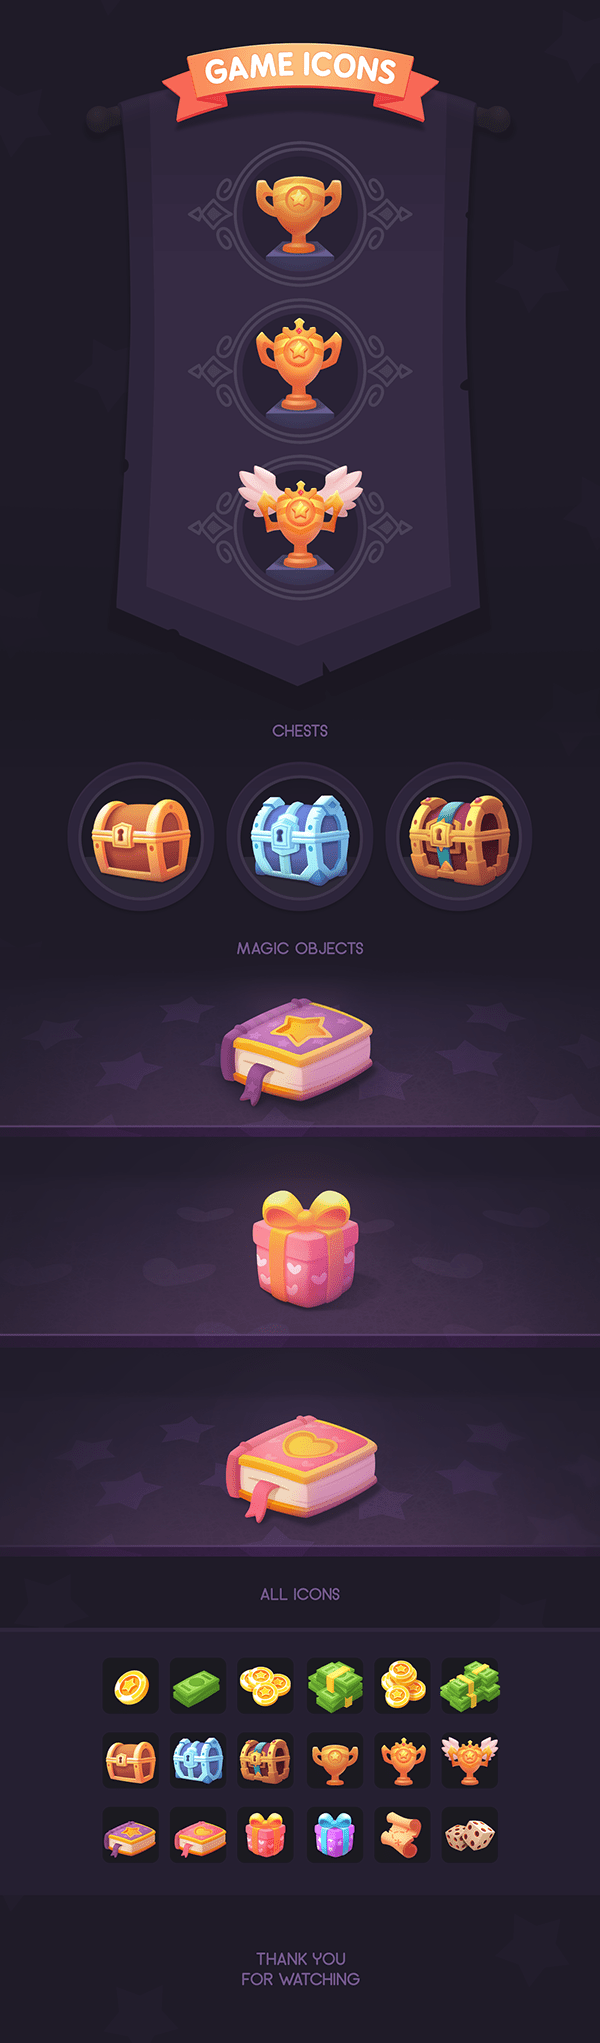 Kameleon Taster Pack Free Icons Graphic Burger Icon Design